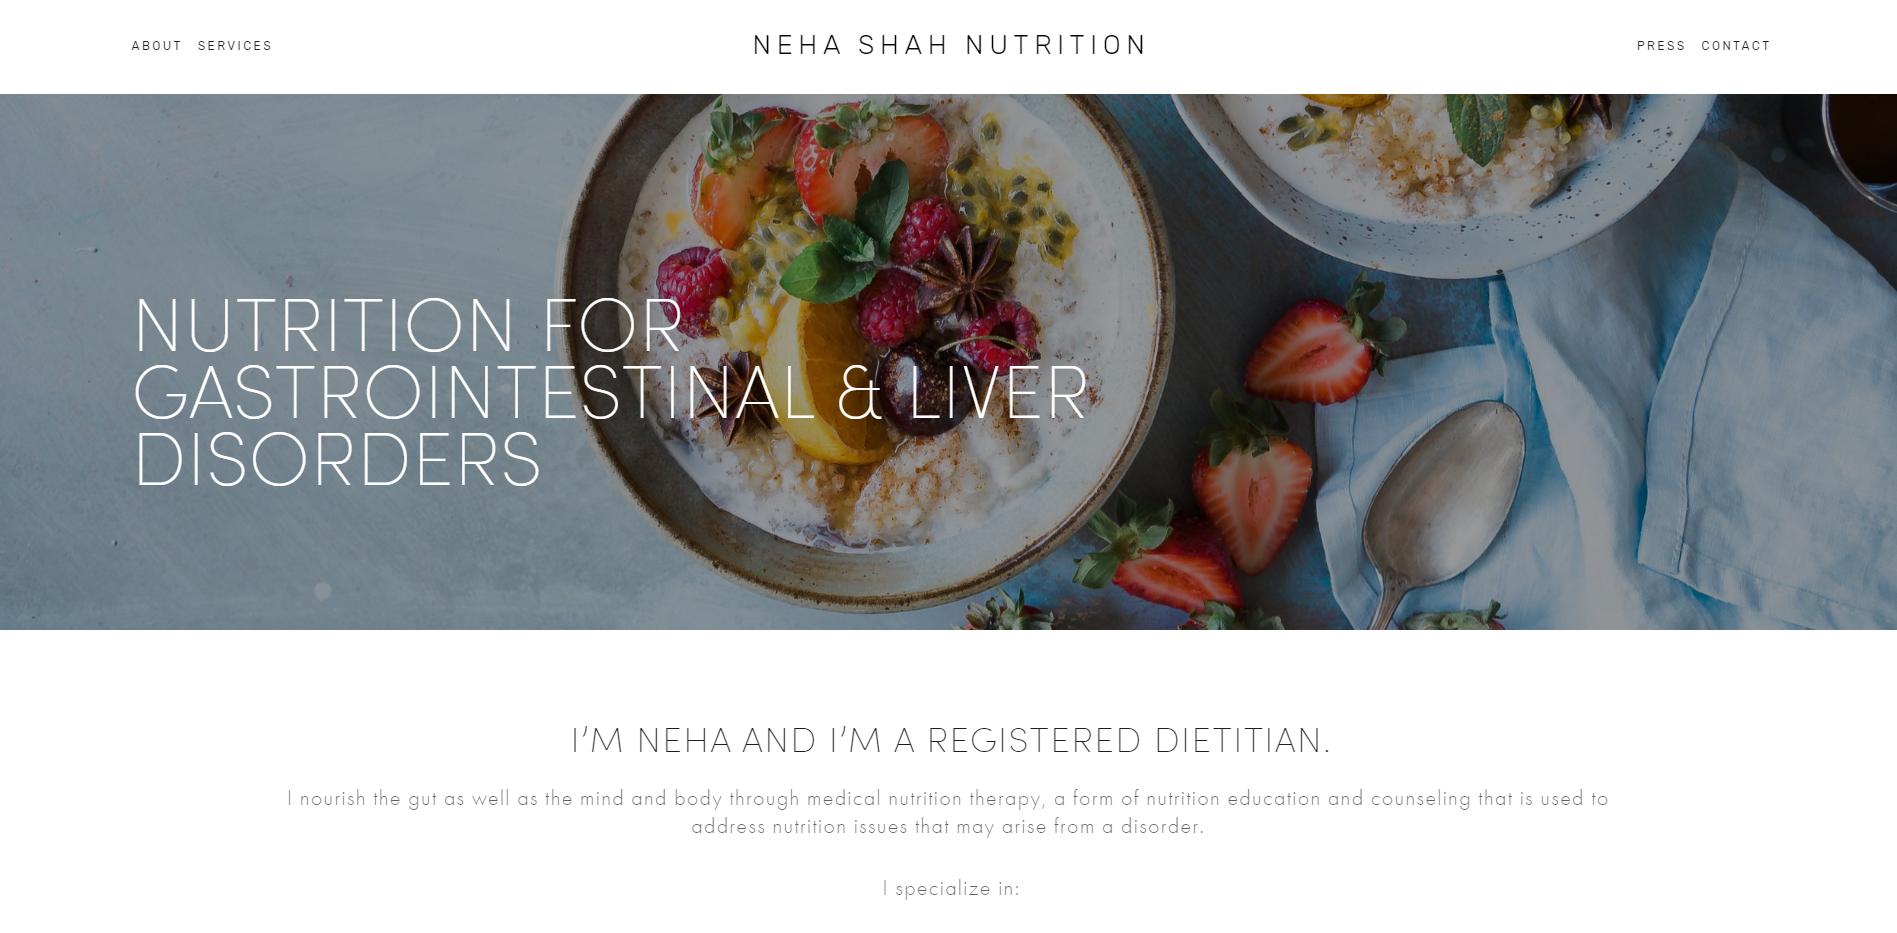 Neha Shah Nutrition